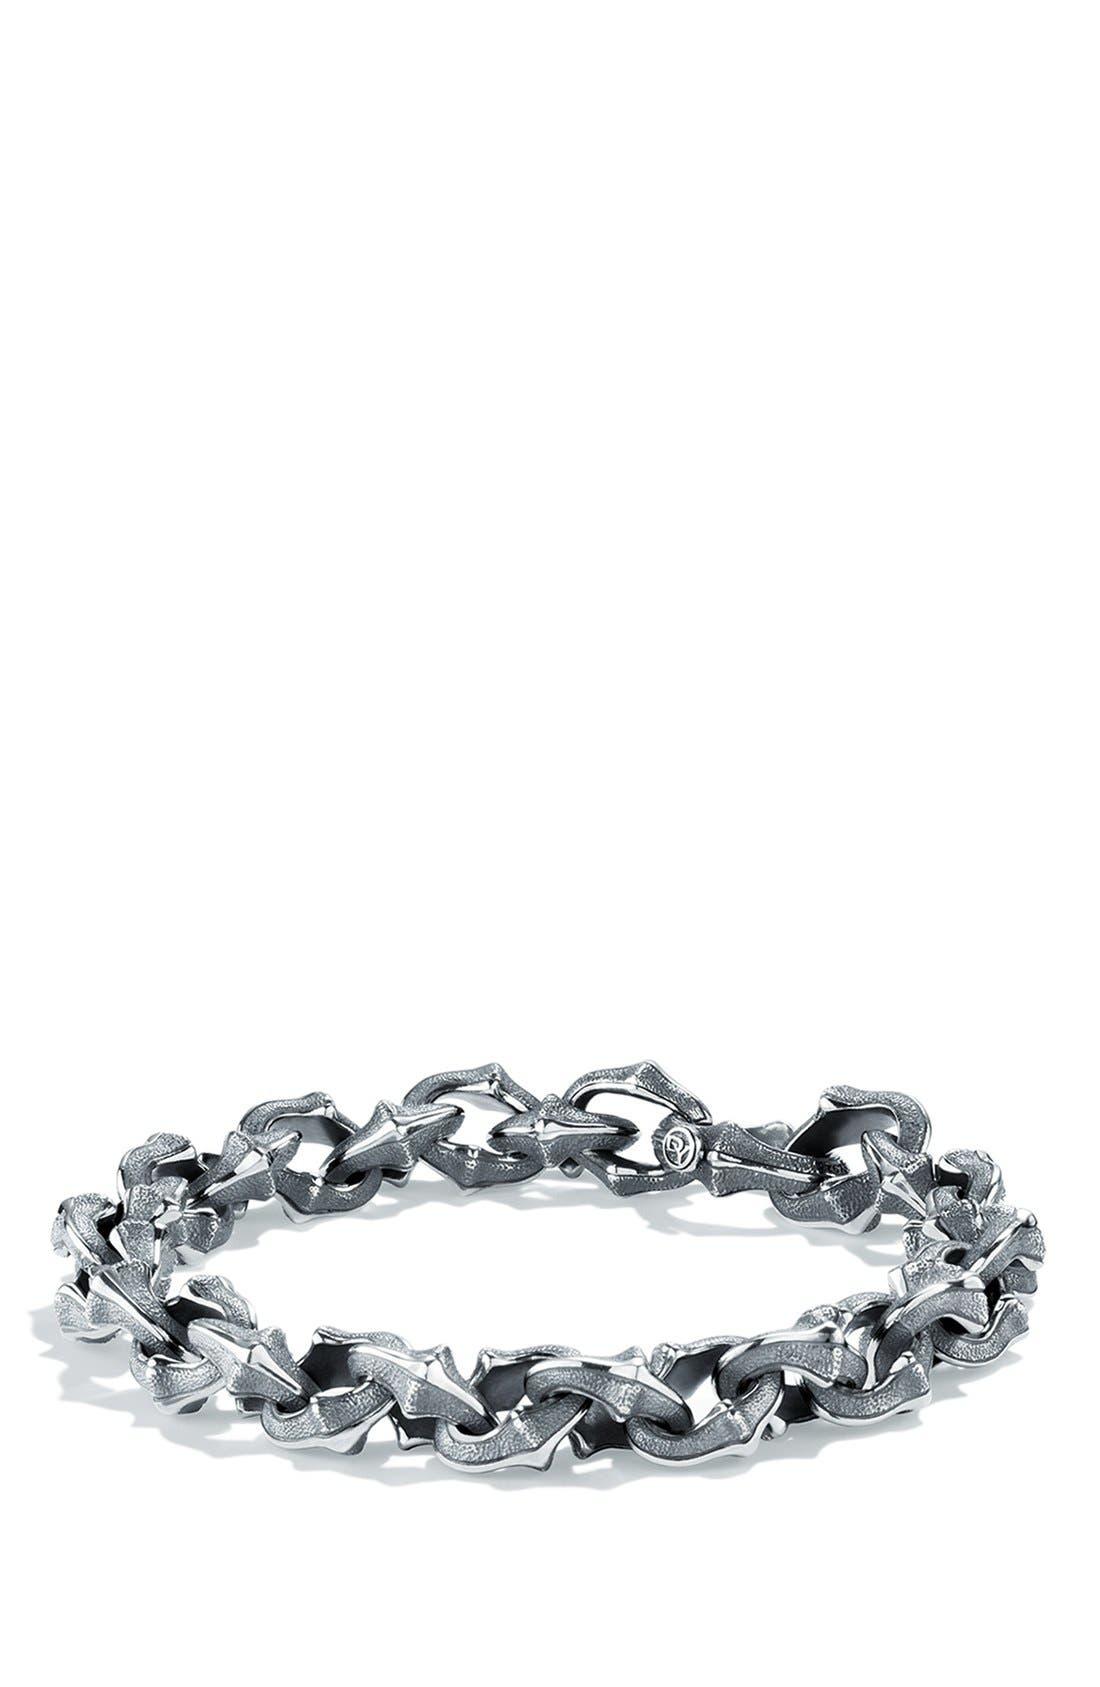 Main Image - David Yurman 'Armory' Small Link Bracelet